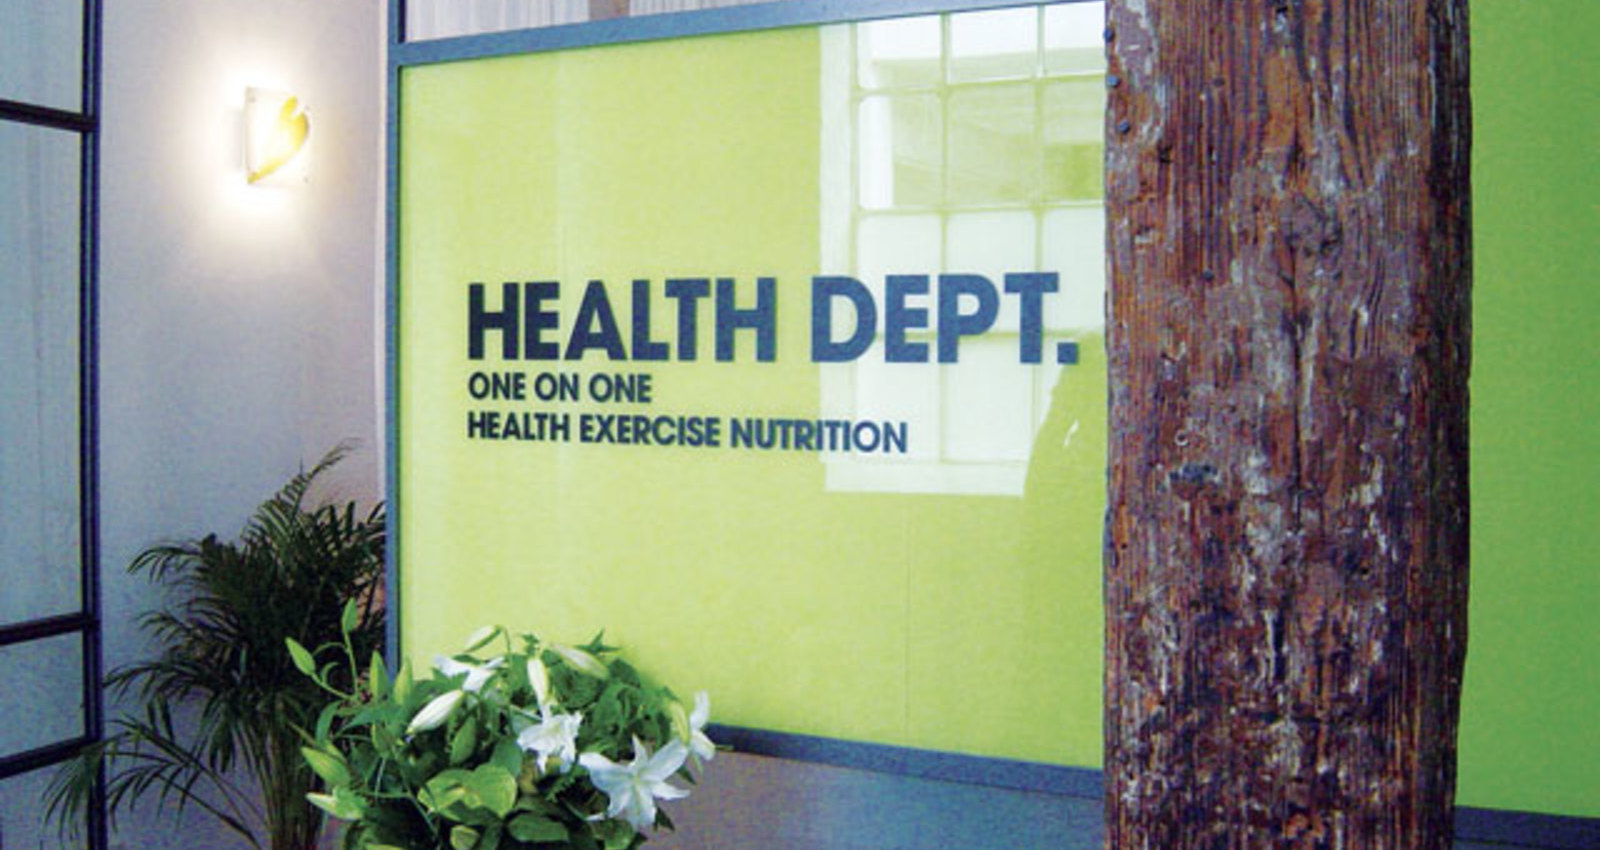 Health Dept.